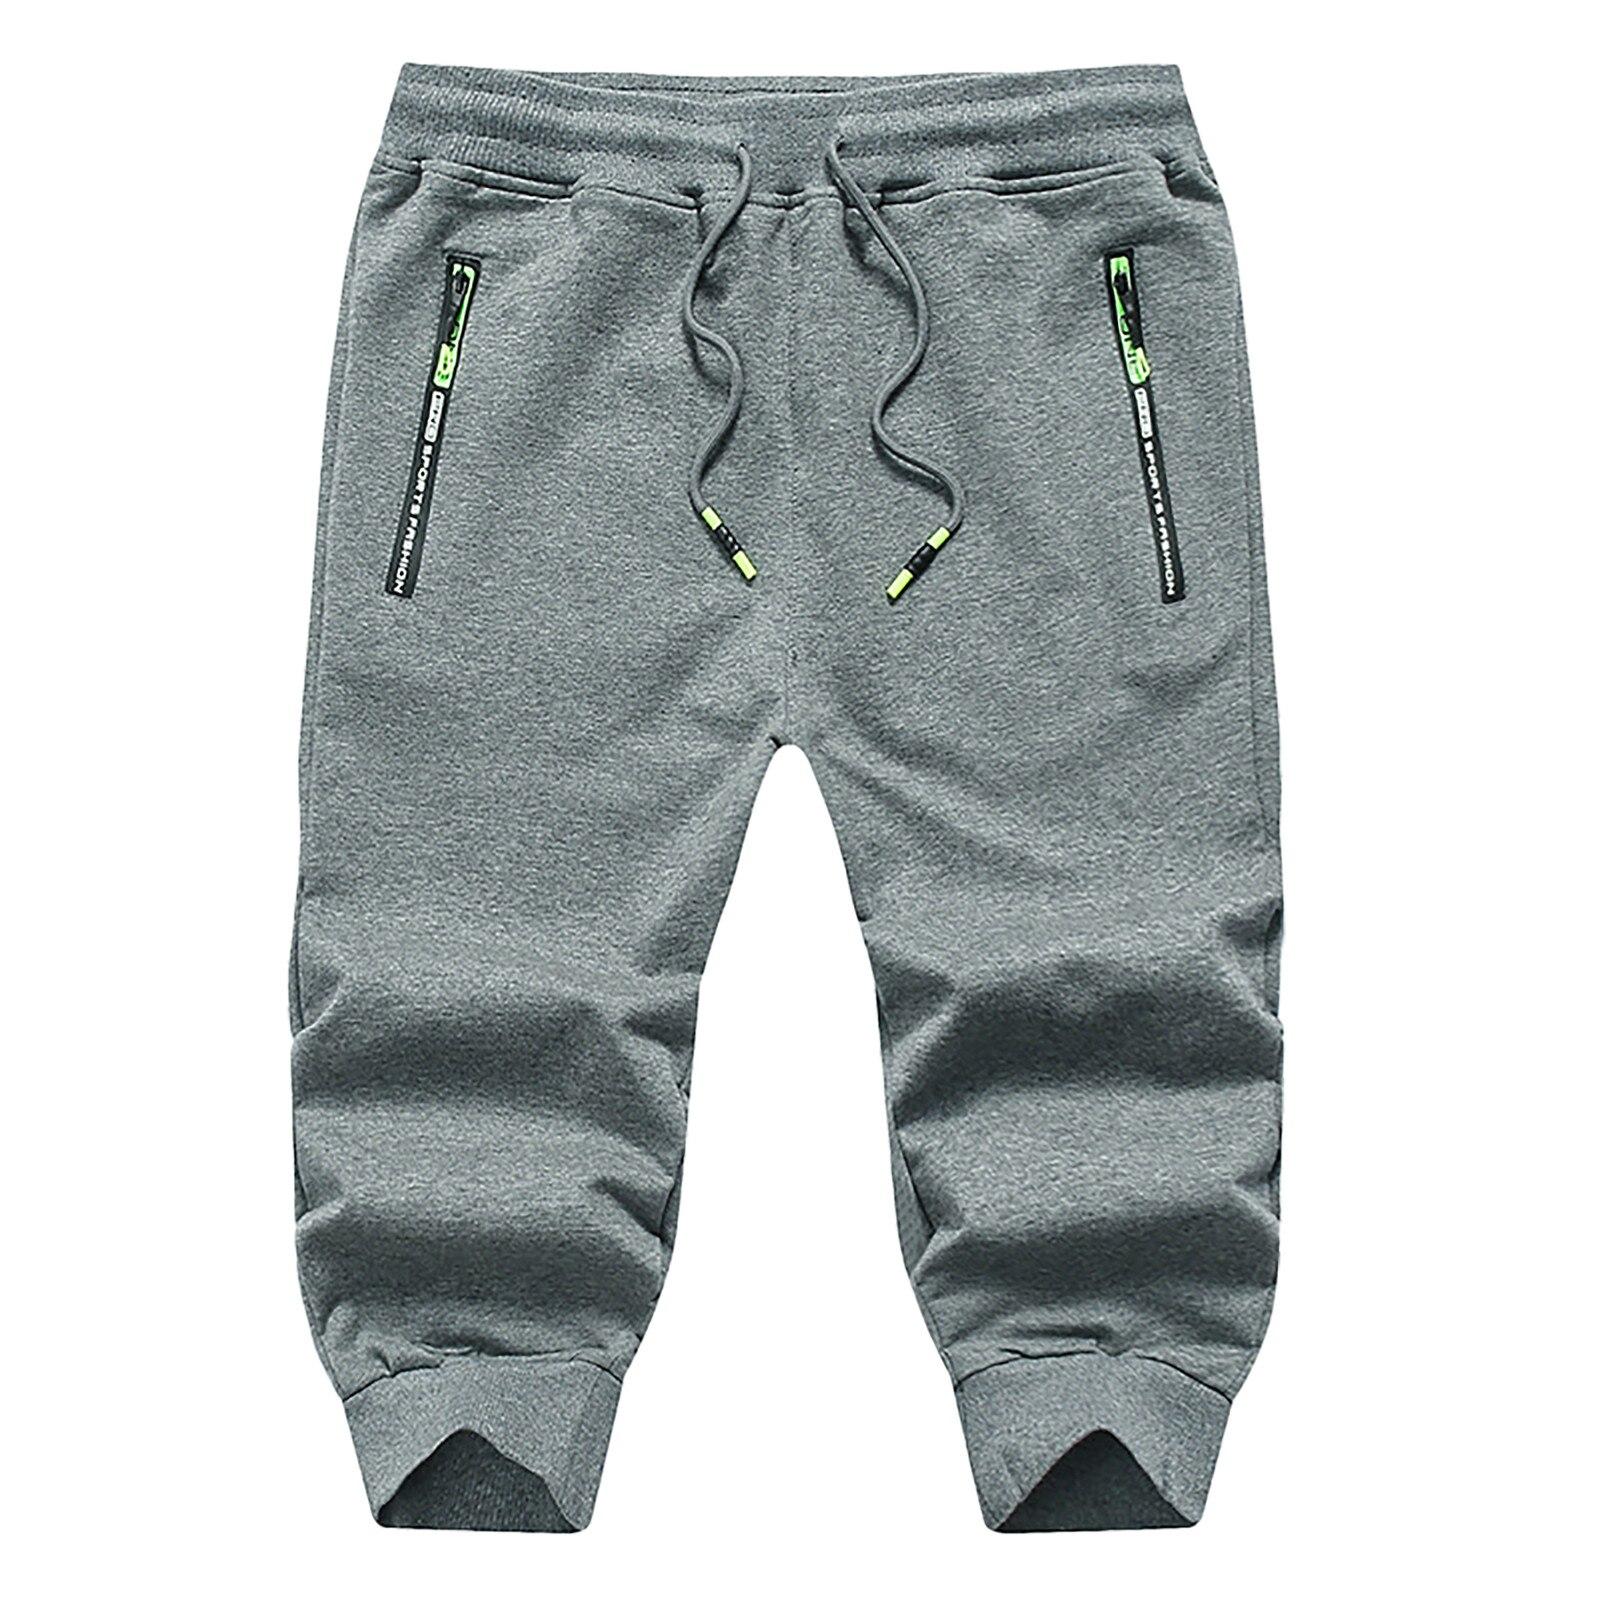 100% Cotton Soft Shorts Men Summer Casual Home Stay Men's Running Shorts Sporting Men Shorts Jogging Short Pants Men